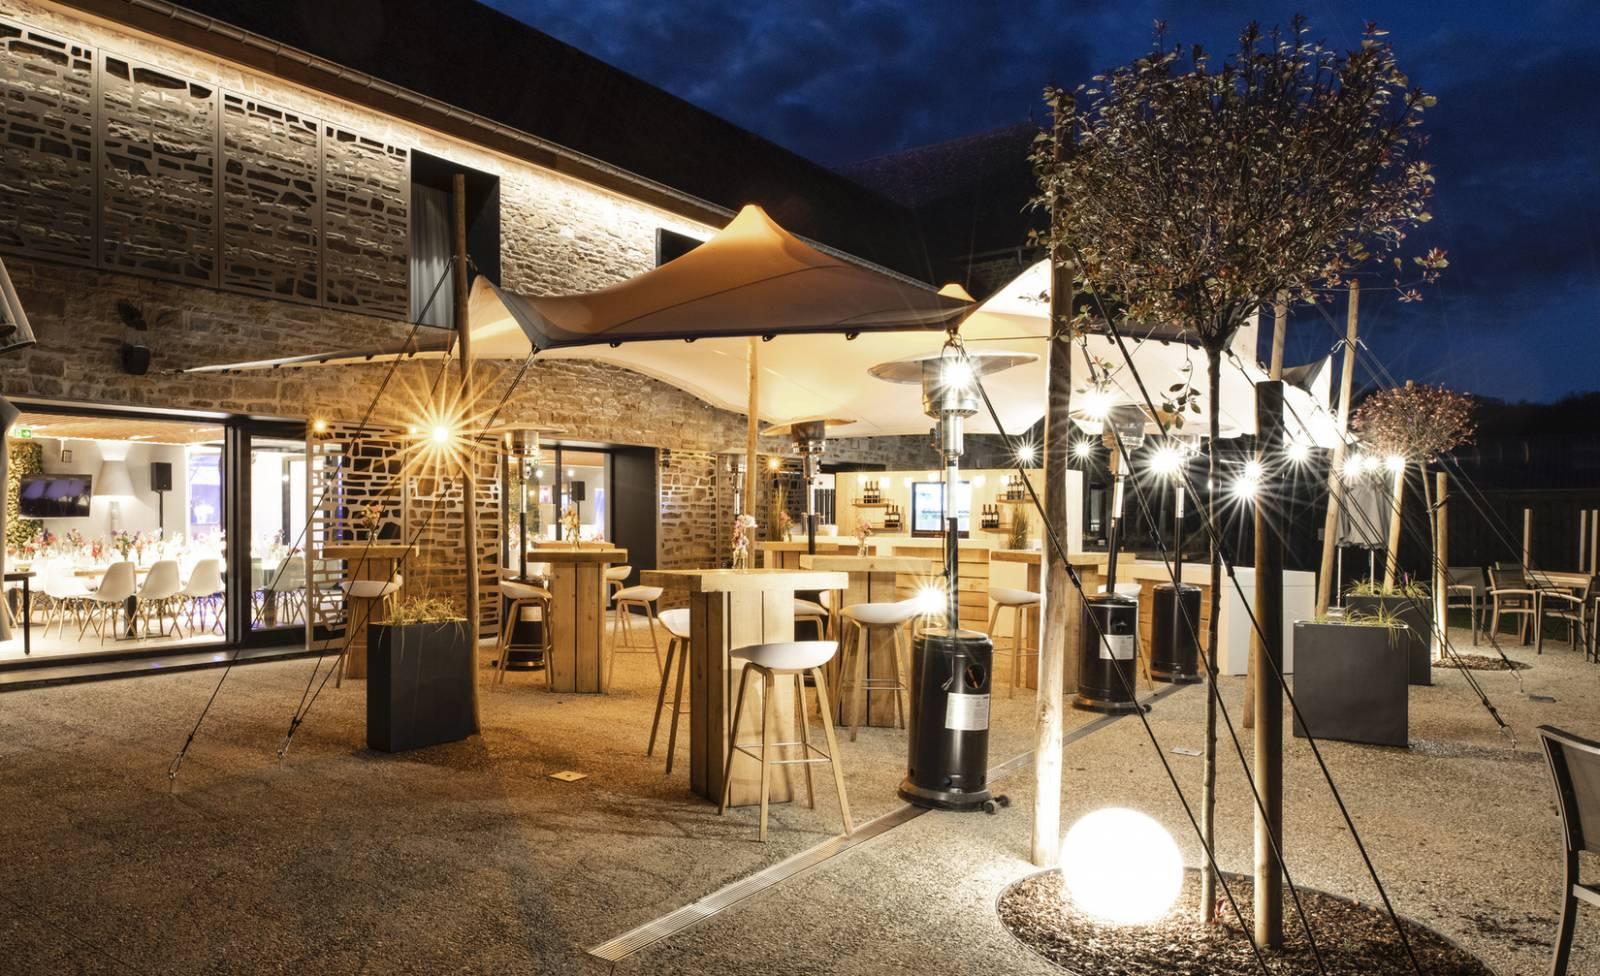 Five Nations Golf Club & Hotel - Durbuy - Feestzaal - Trouwzaal - Trouwlocatie - House of Weddingsh800-772776PEDFLBts